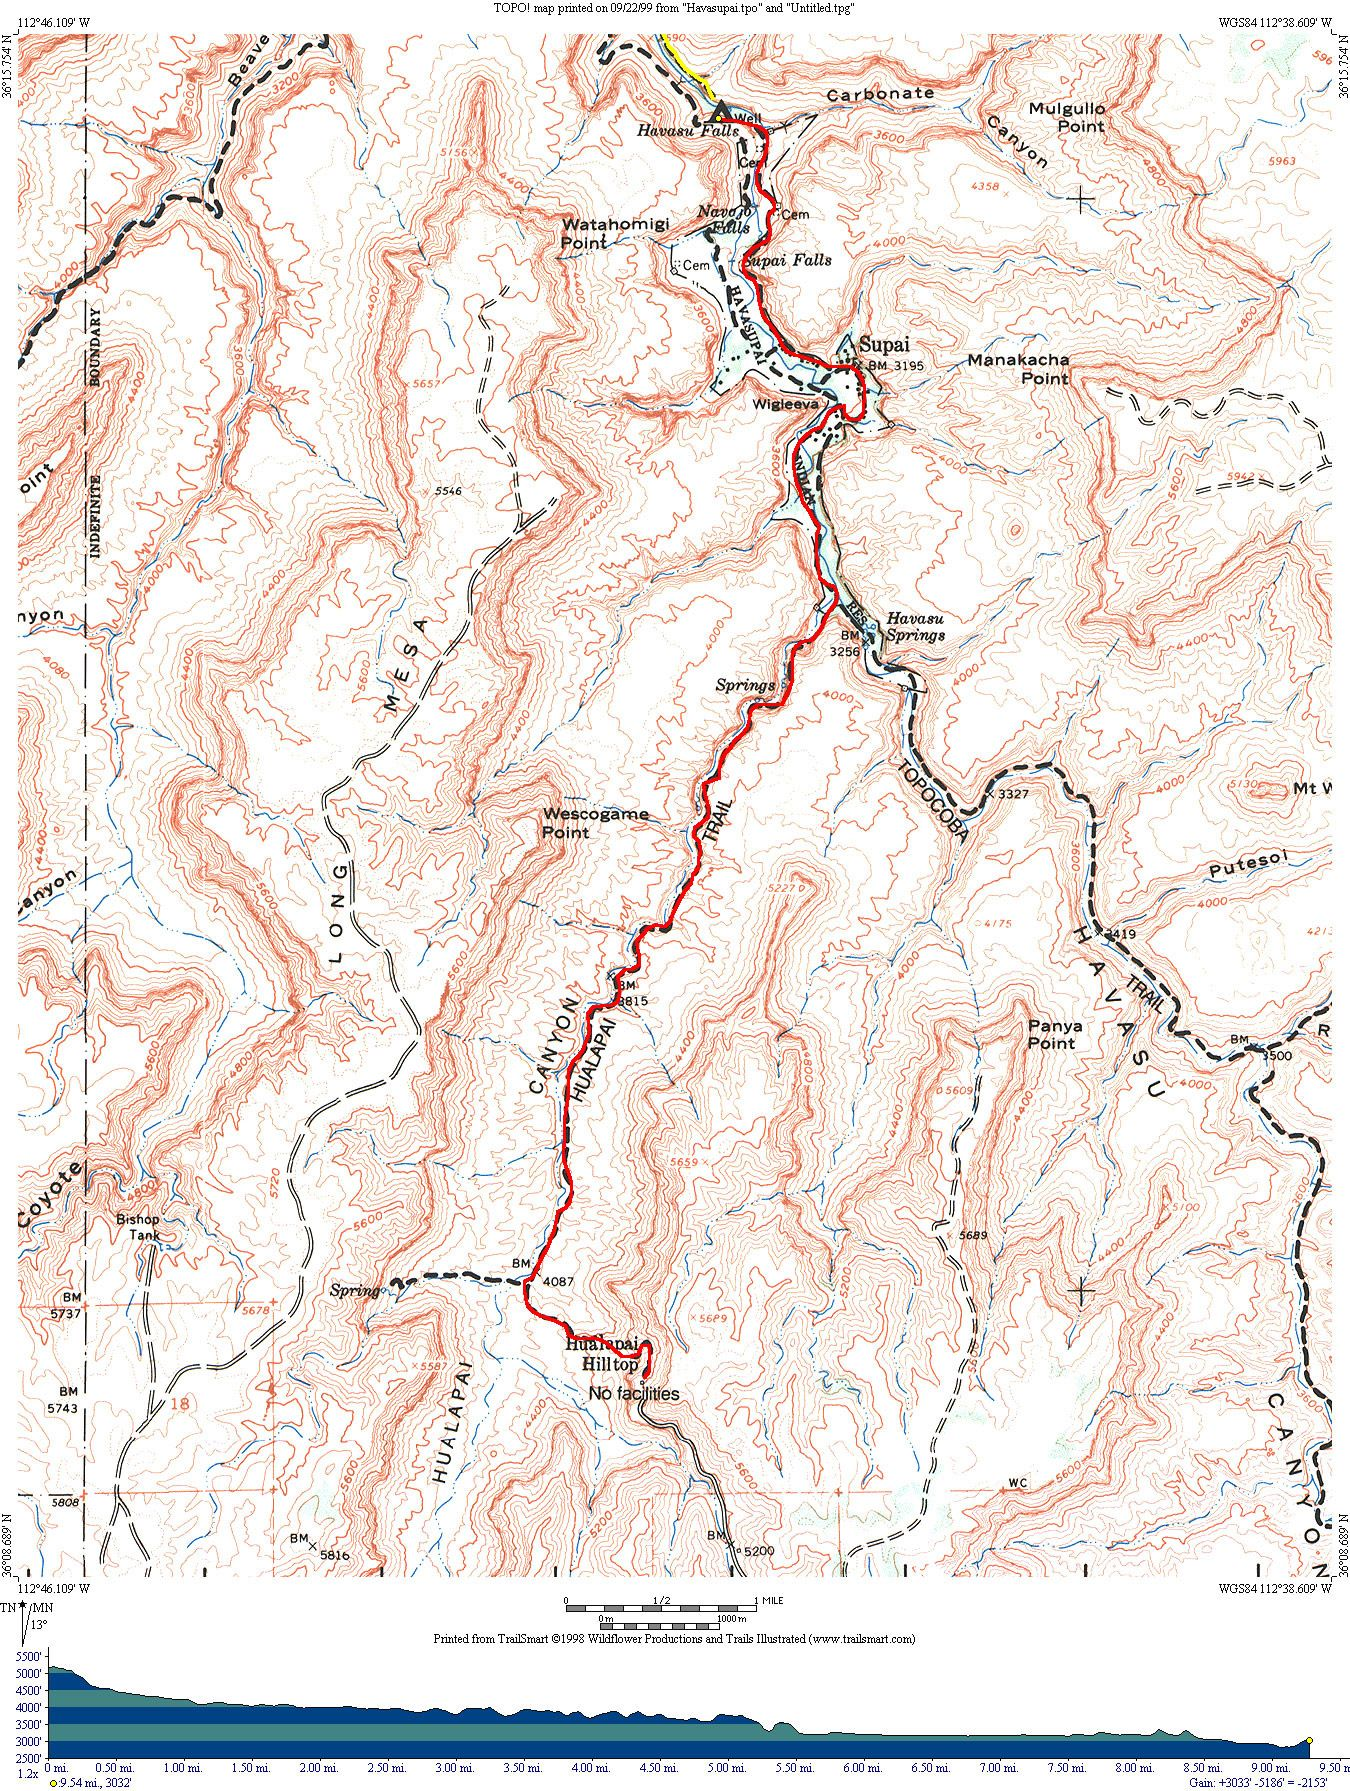 Grand Canyon Havasupai Campground Map Grand Canyon Havasupai - Grand canyon campground map